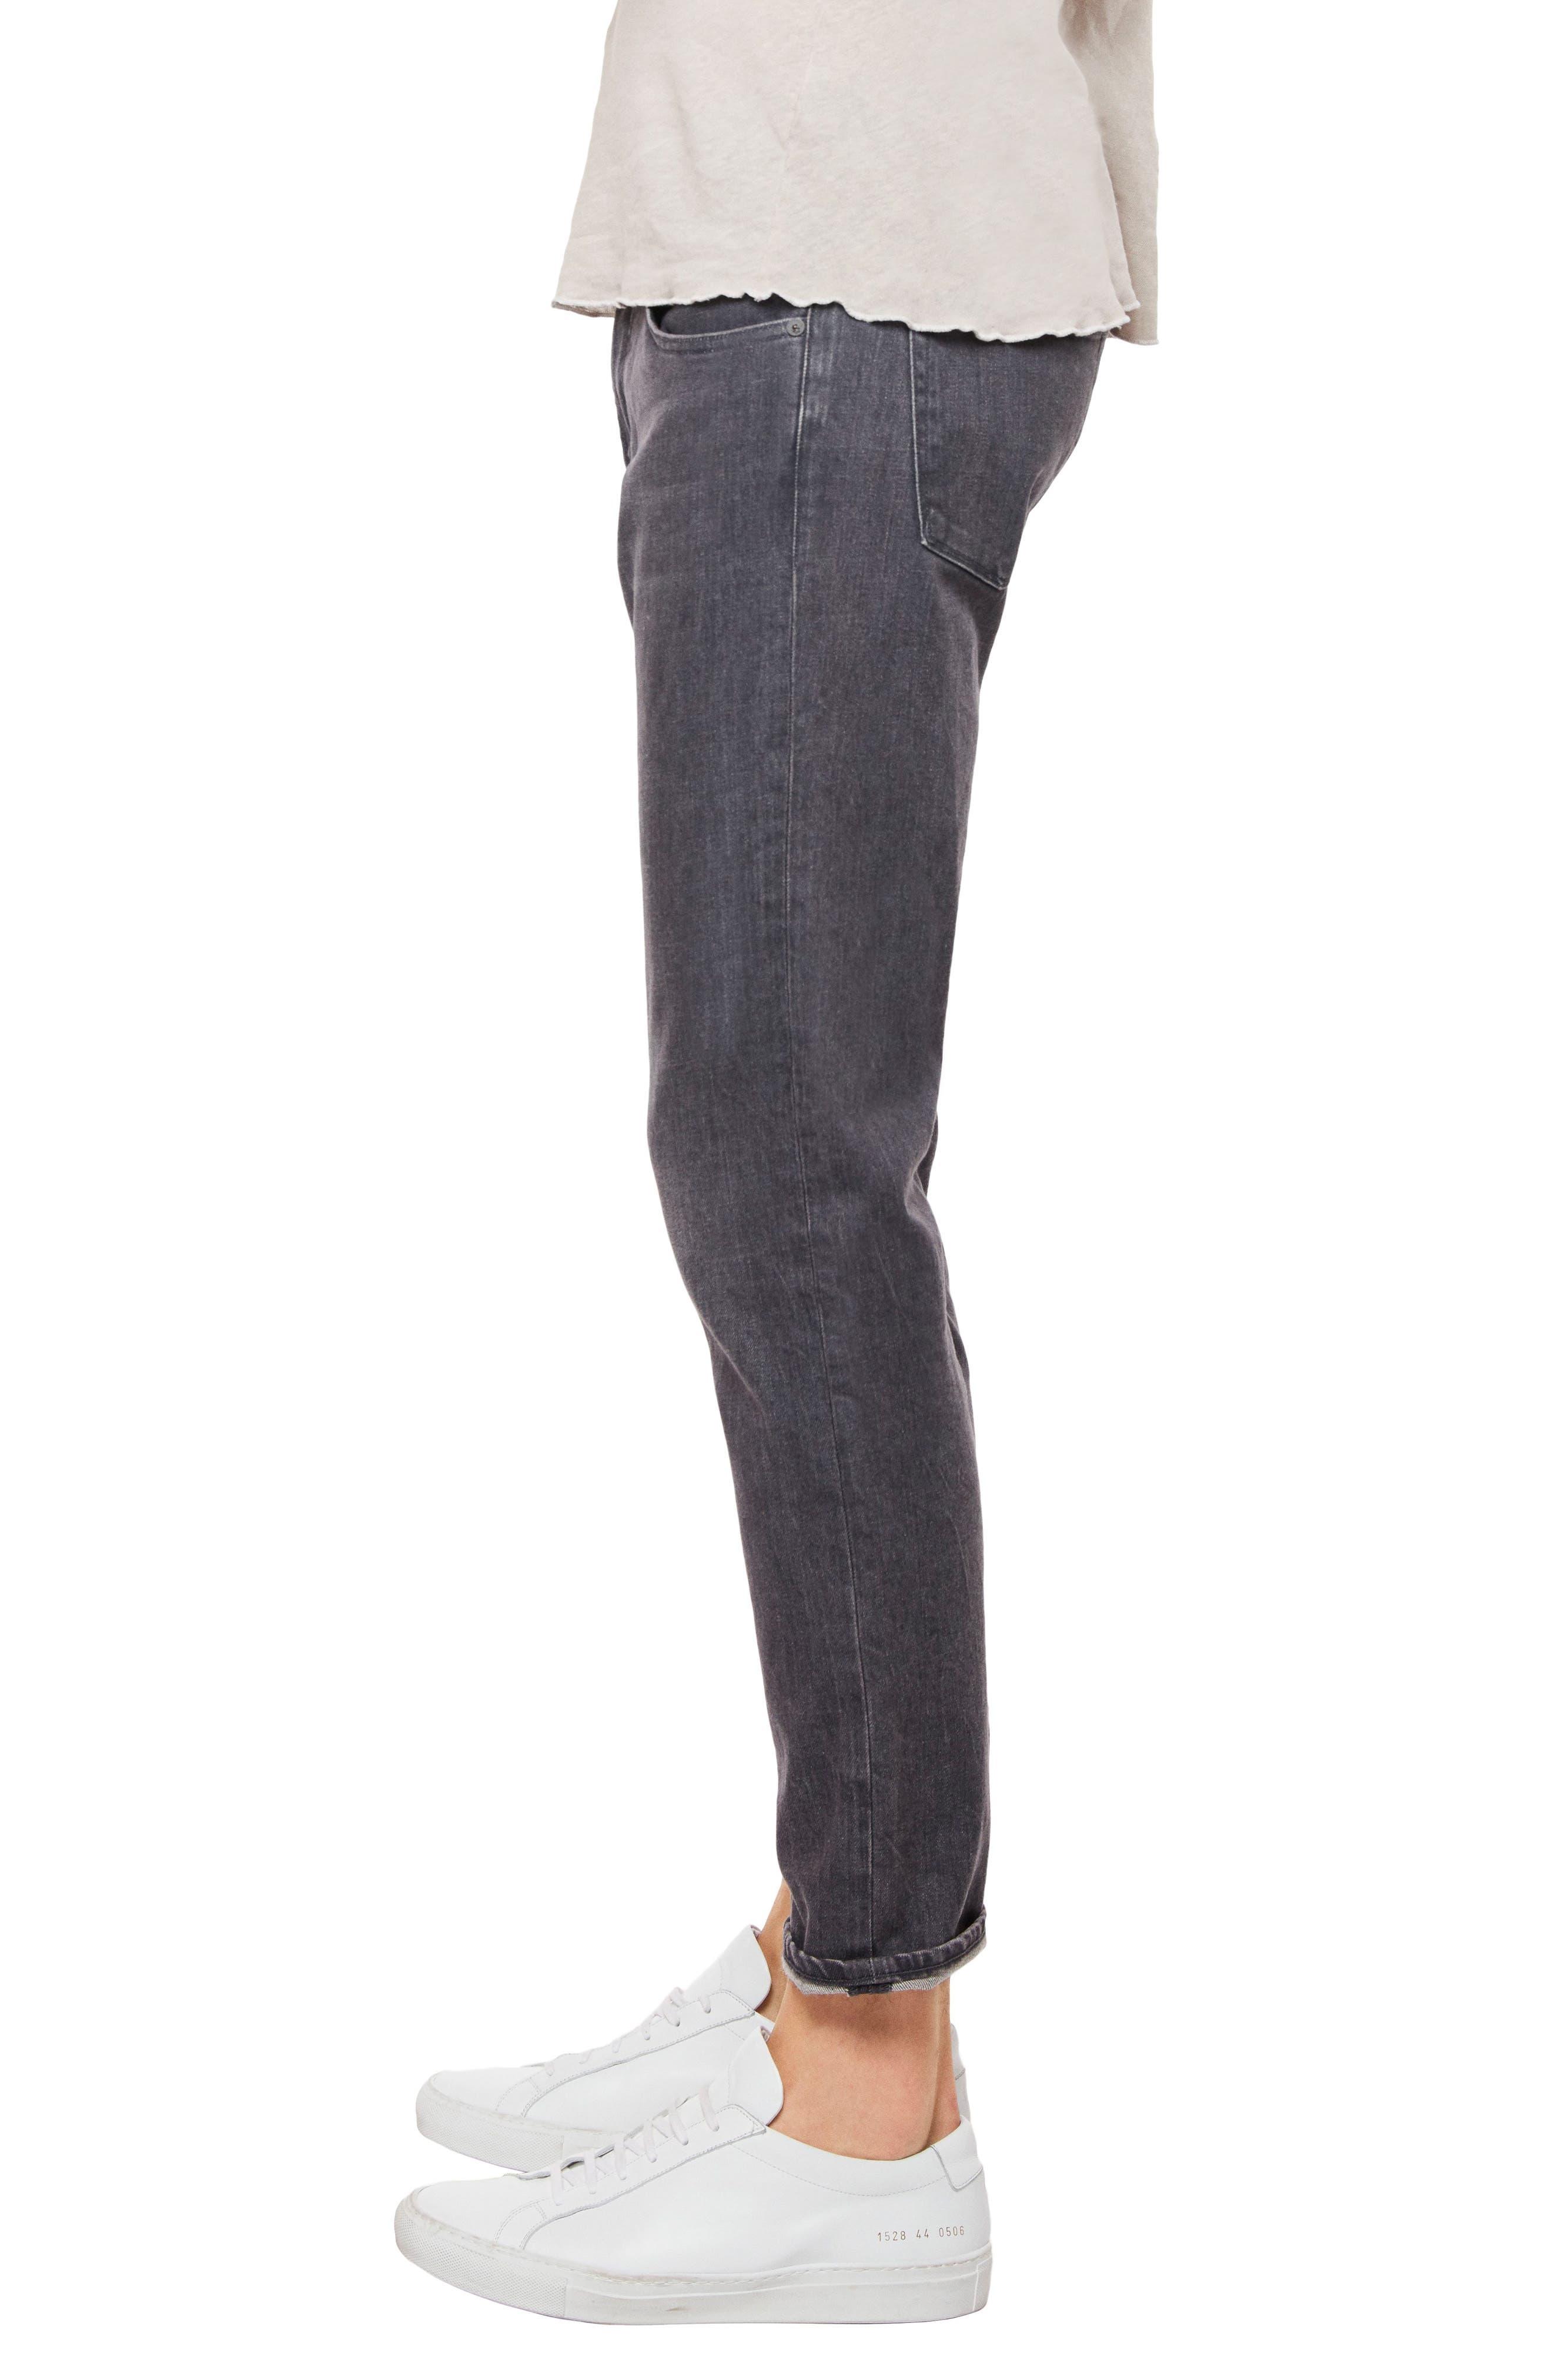 Eli Slim Fit Jeans,                             Alternate thumbnail 3, color,                             Topography